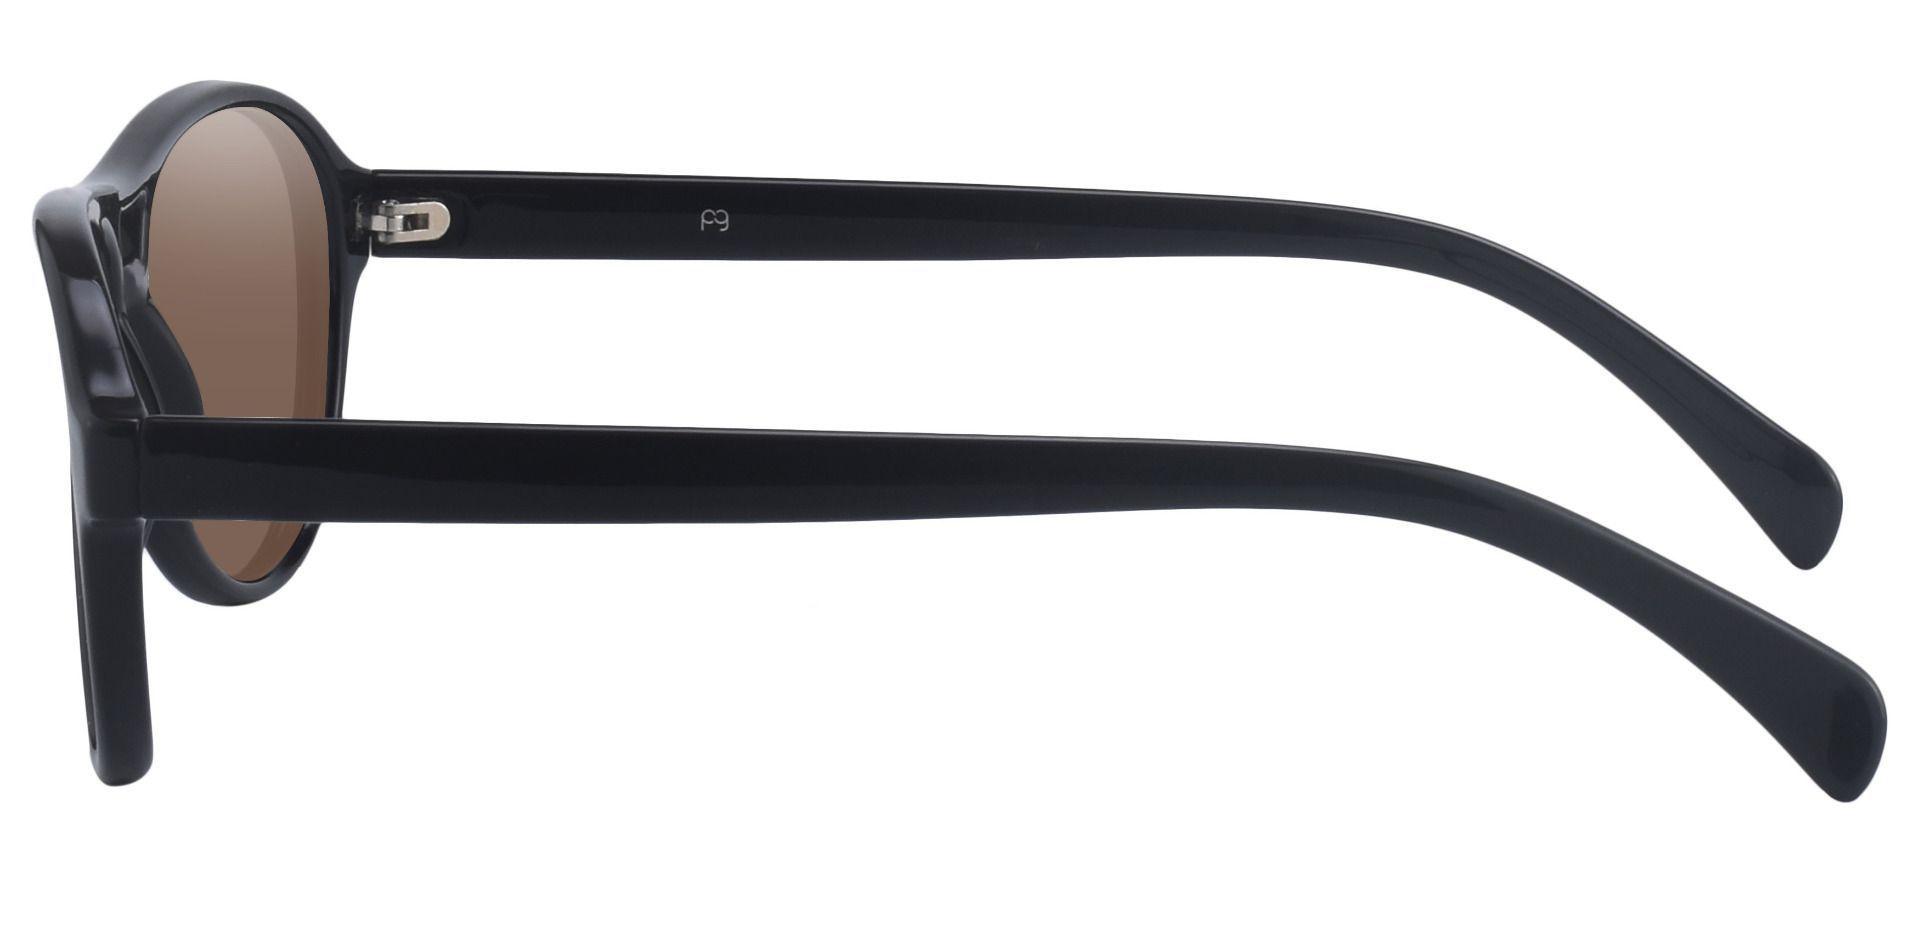 Sosa Aviator Prescription Sunglasses - Black Frame With Brown Lenses